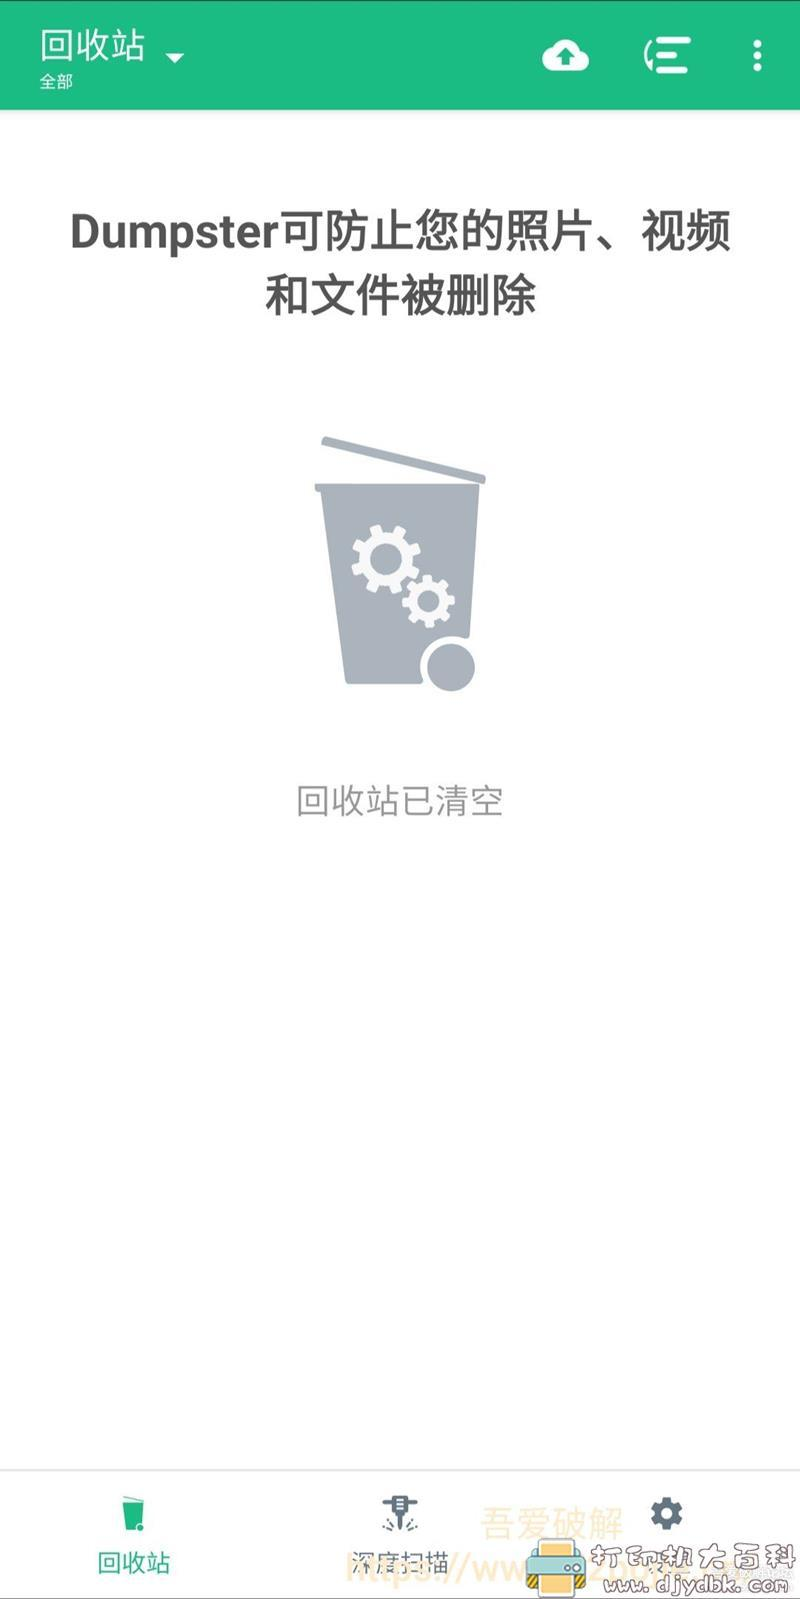 [Android]深度数据恢复 v3.3.370 专业版,恢复图片、音视频 配图 No.2